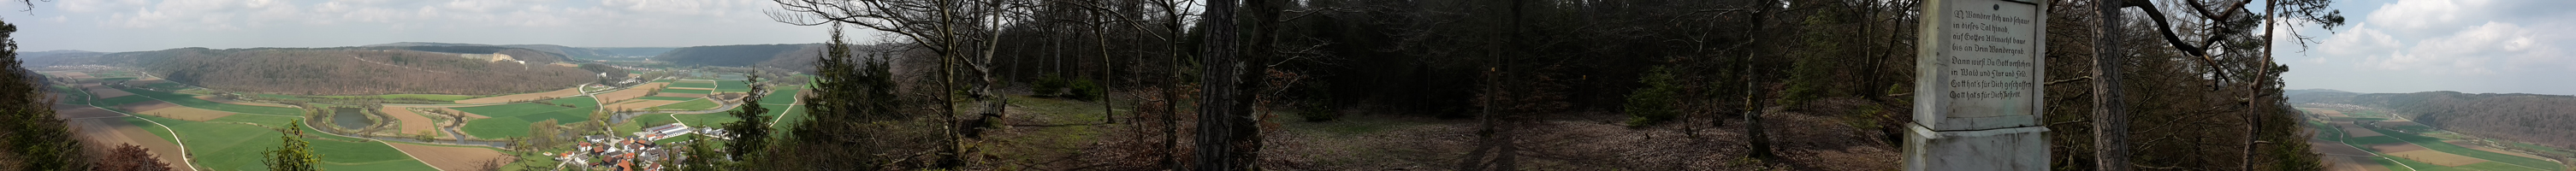 Ausblick-Kinding-Unteremmendorf-Wanderweg